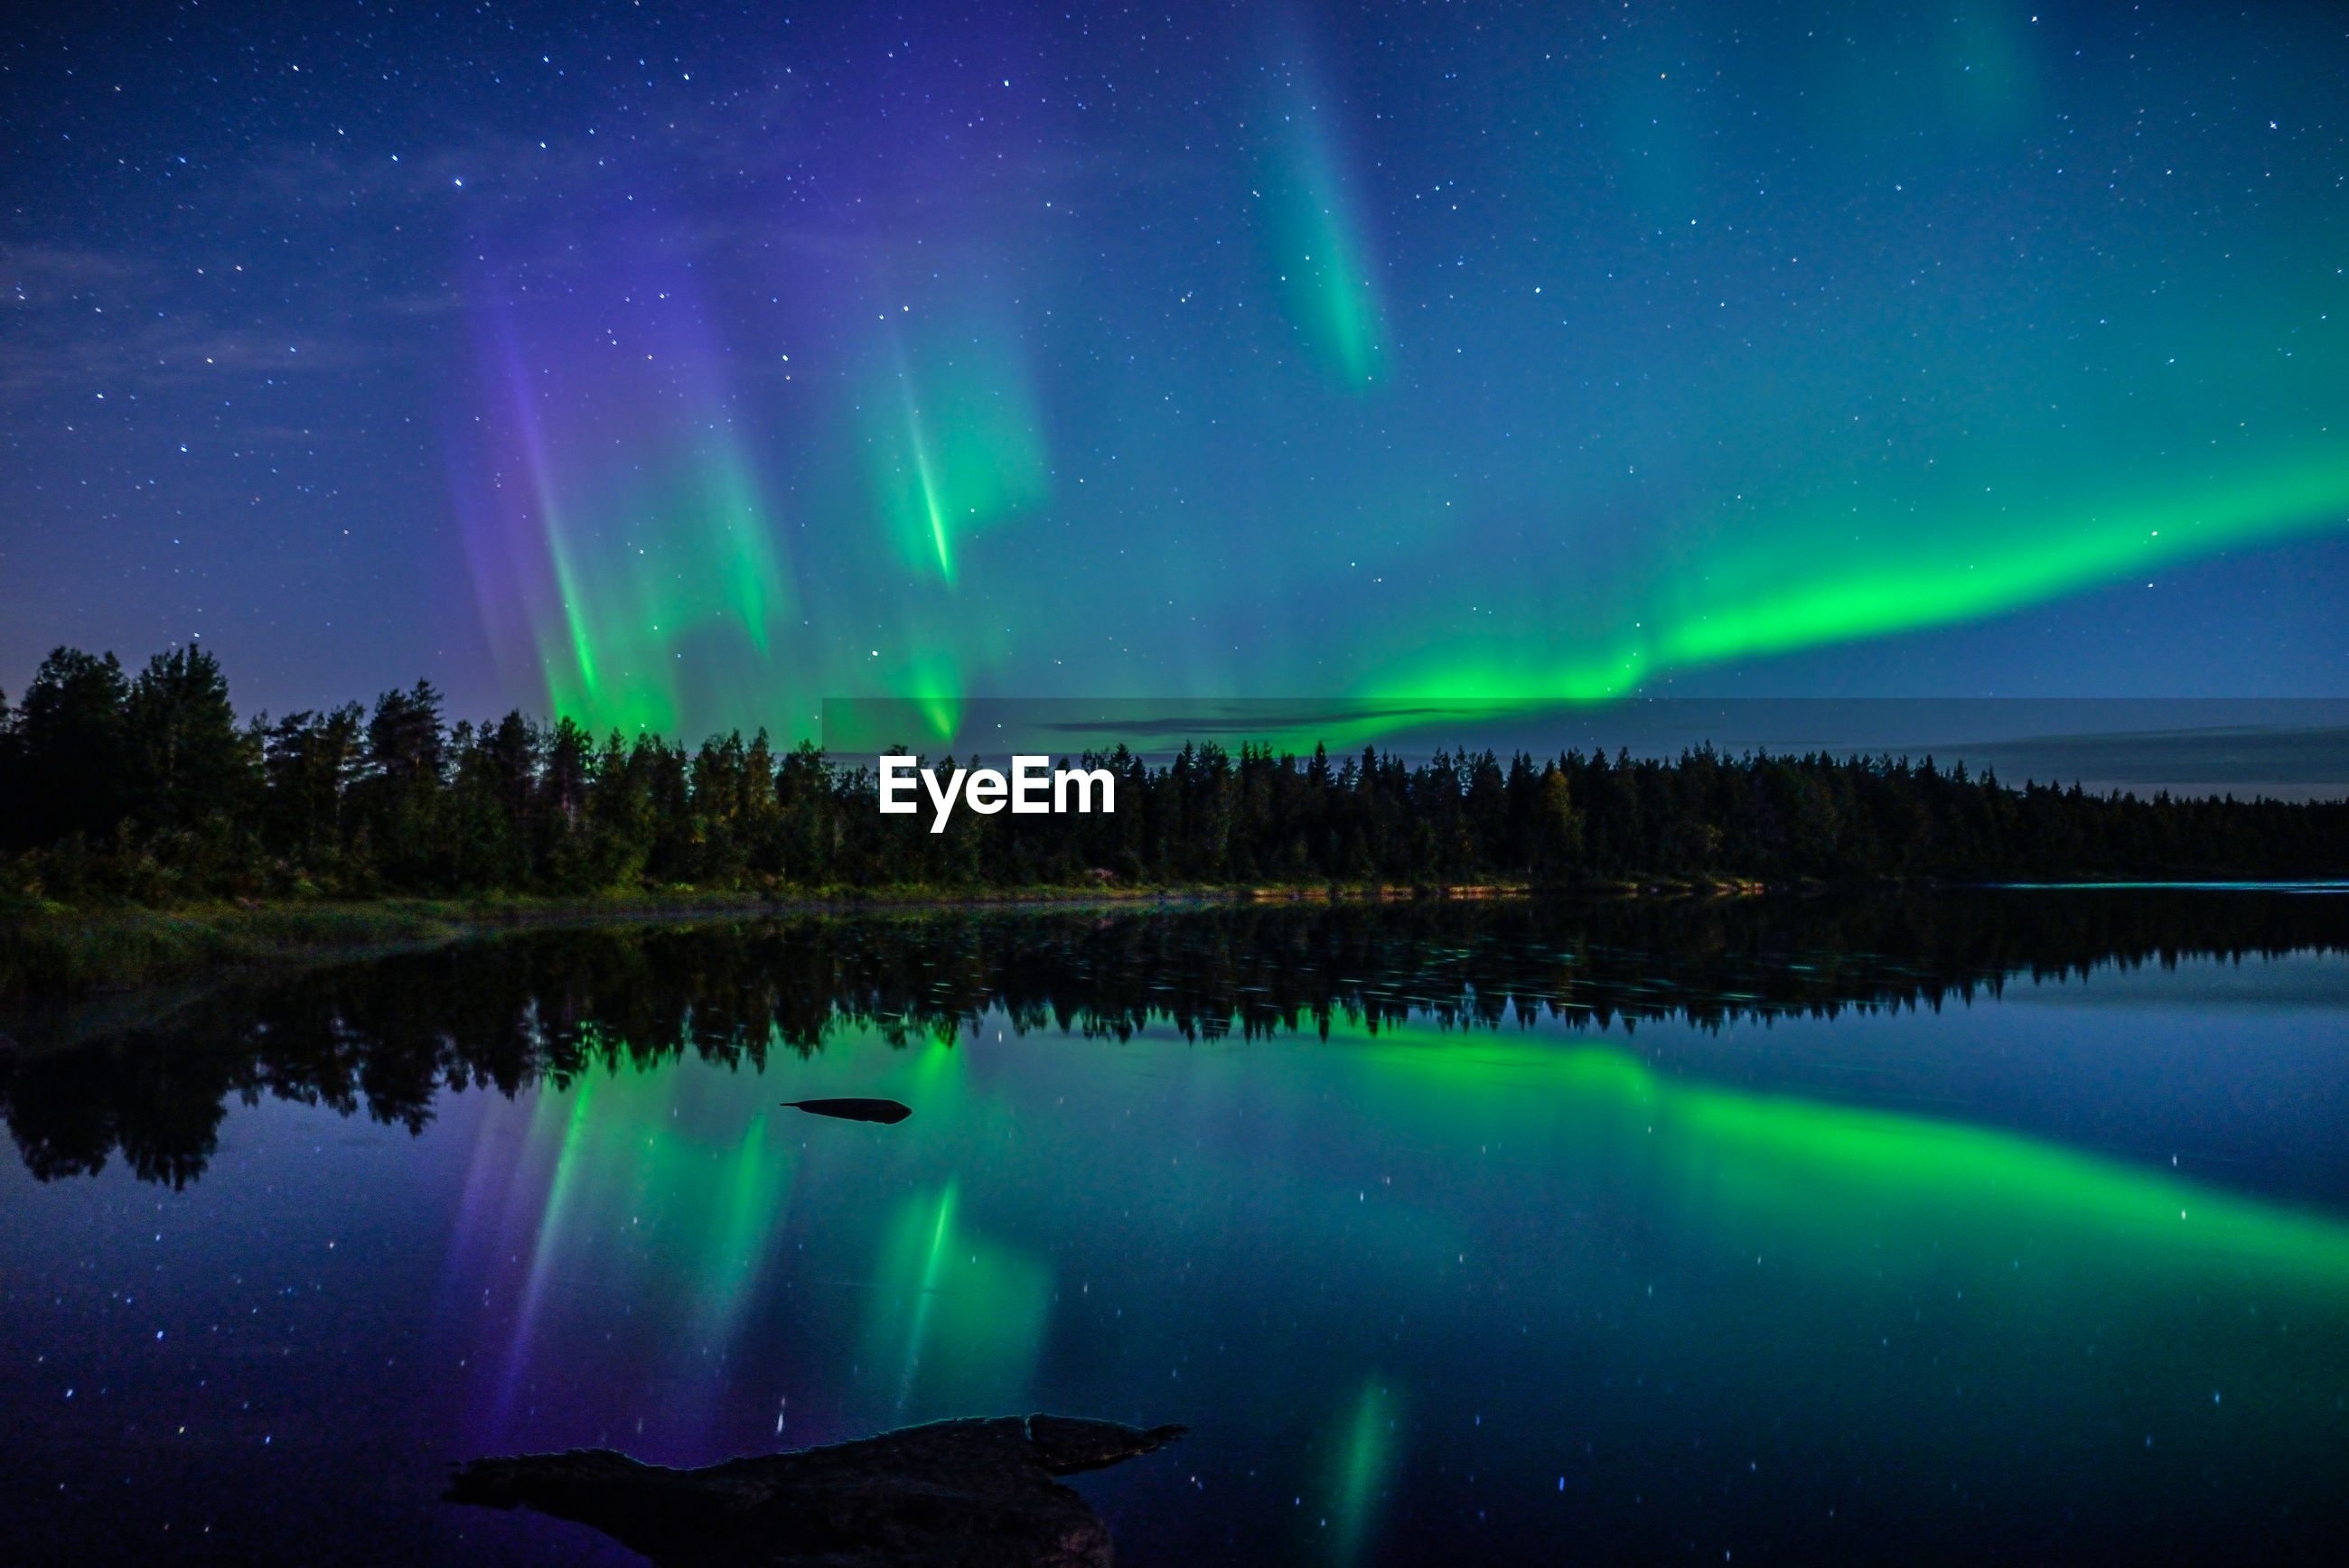 Scenic view of lake against aurora borealis at night